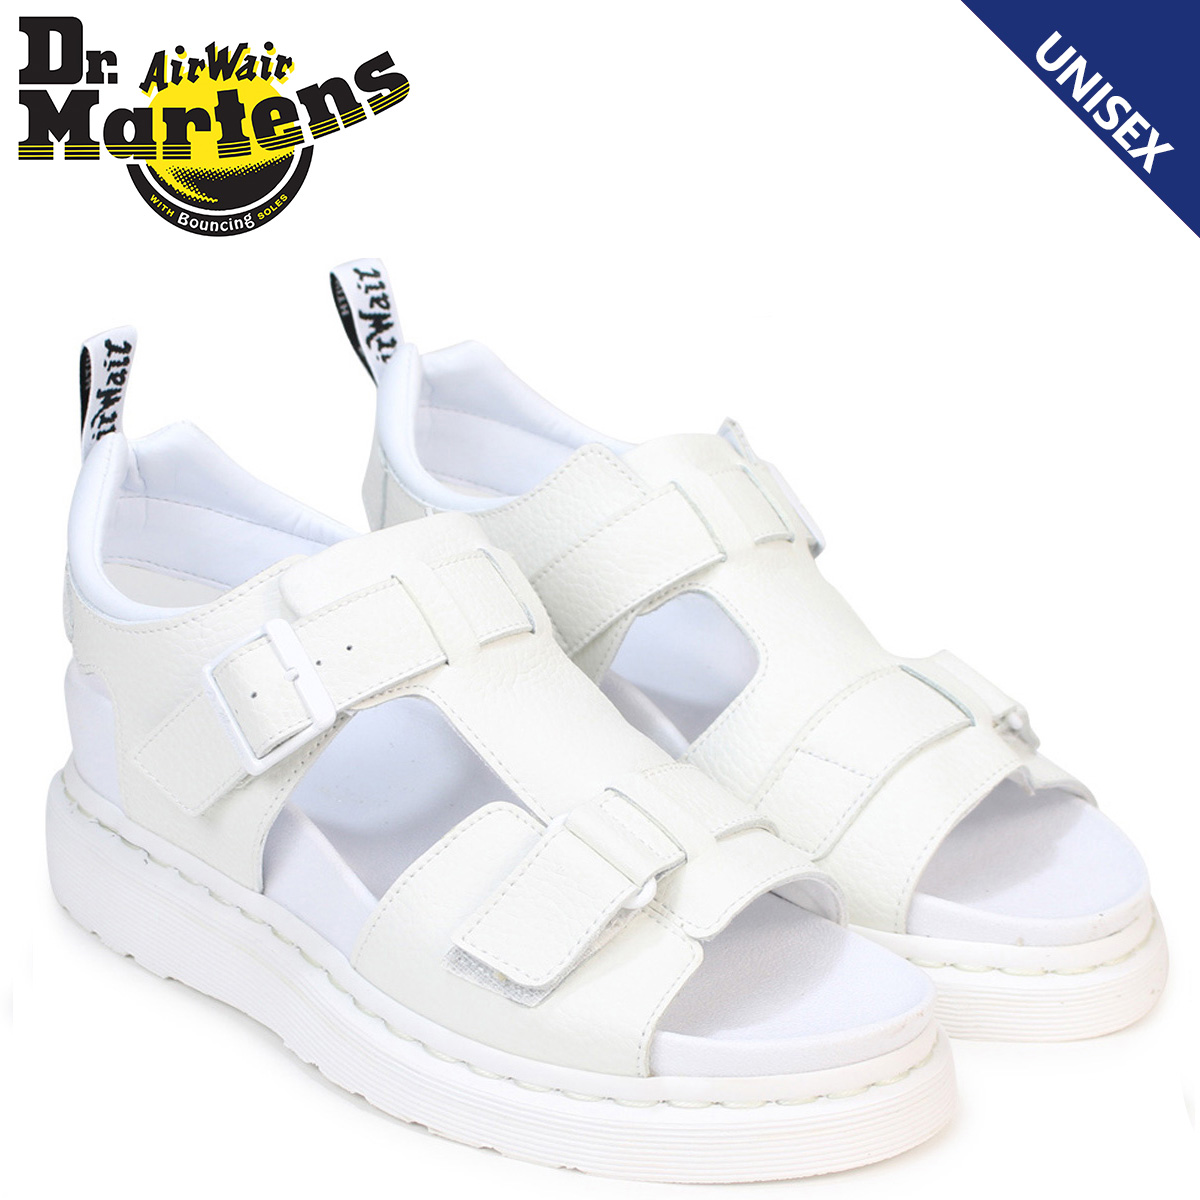 f072119d636 Doctor Martin sandals Lady s men Dr.Martens leather SHORE KAMILAH 2 STRAP  SANDAL 21895100 white  3 29 Shinnyu load